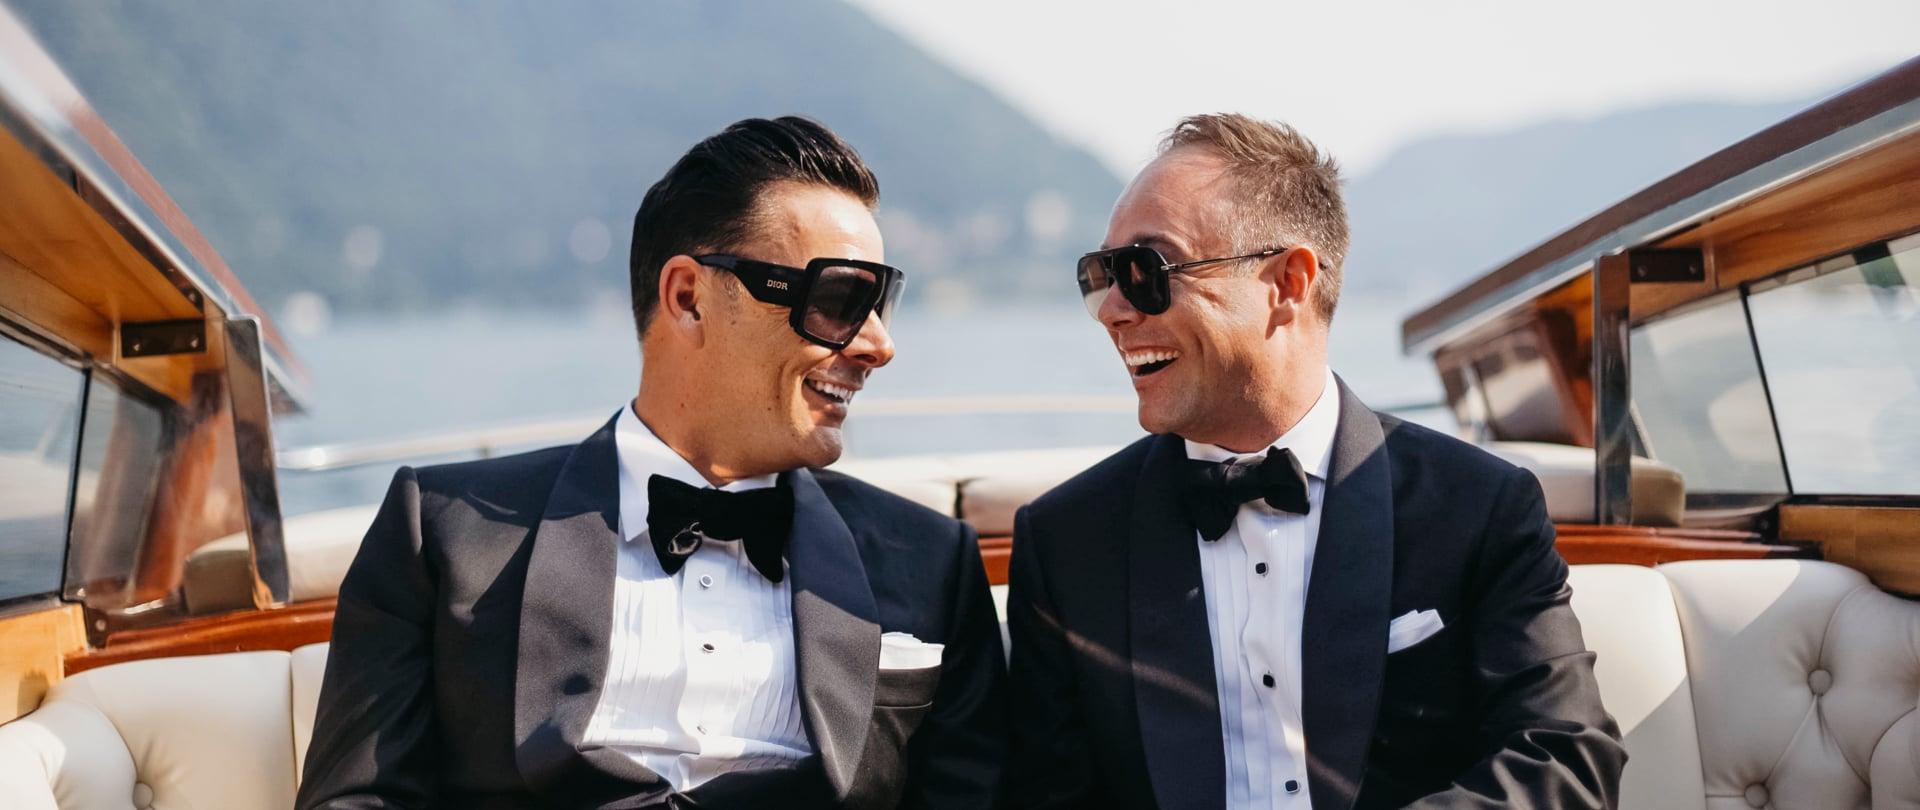 Joel & Shayne Wedding Video Filmed at Lake Como, Italy